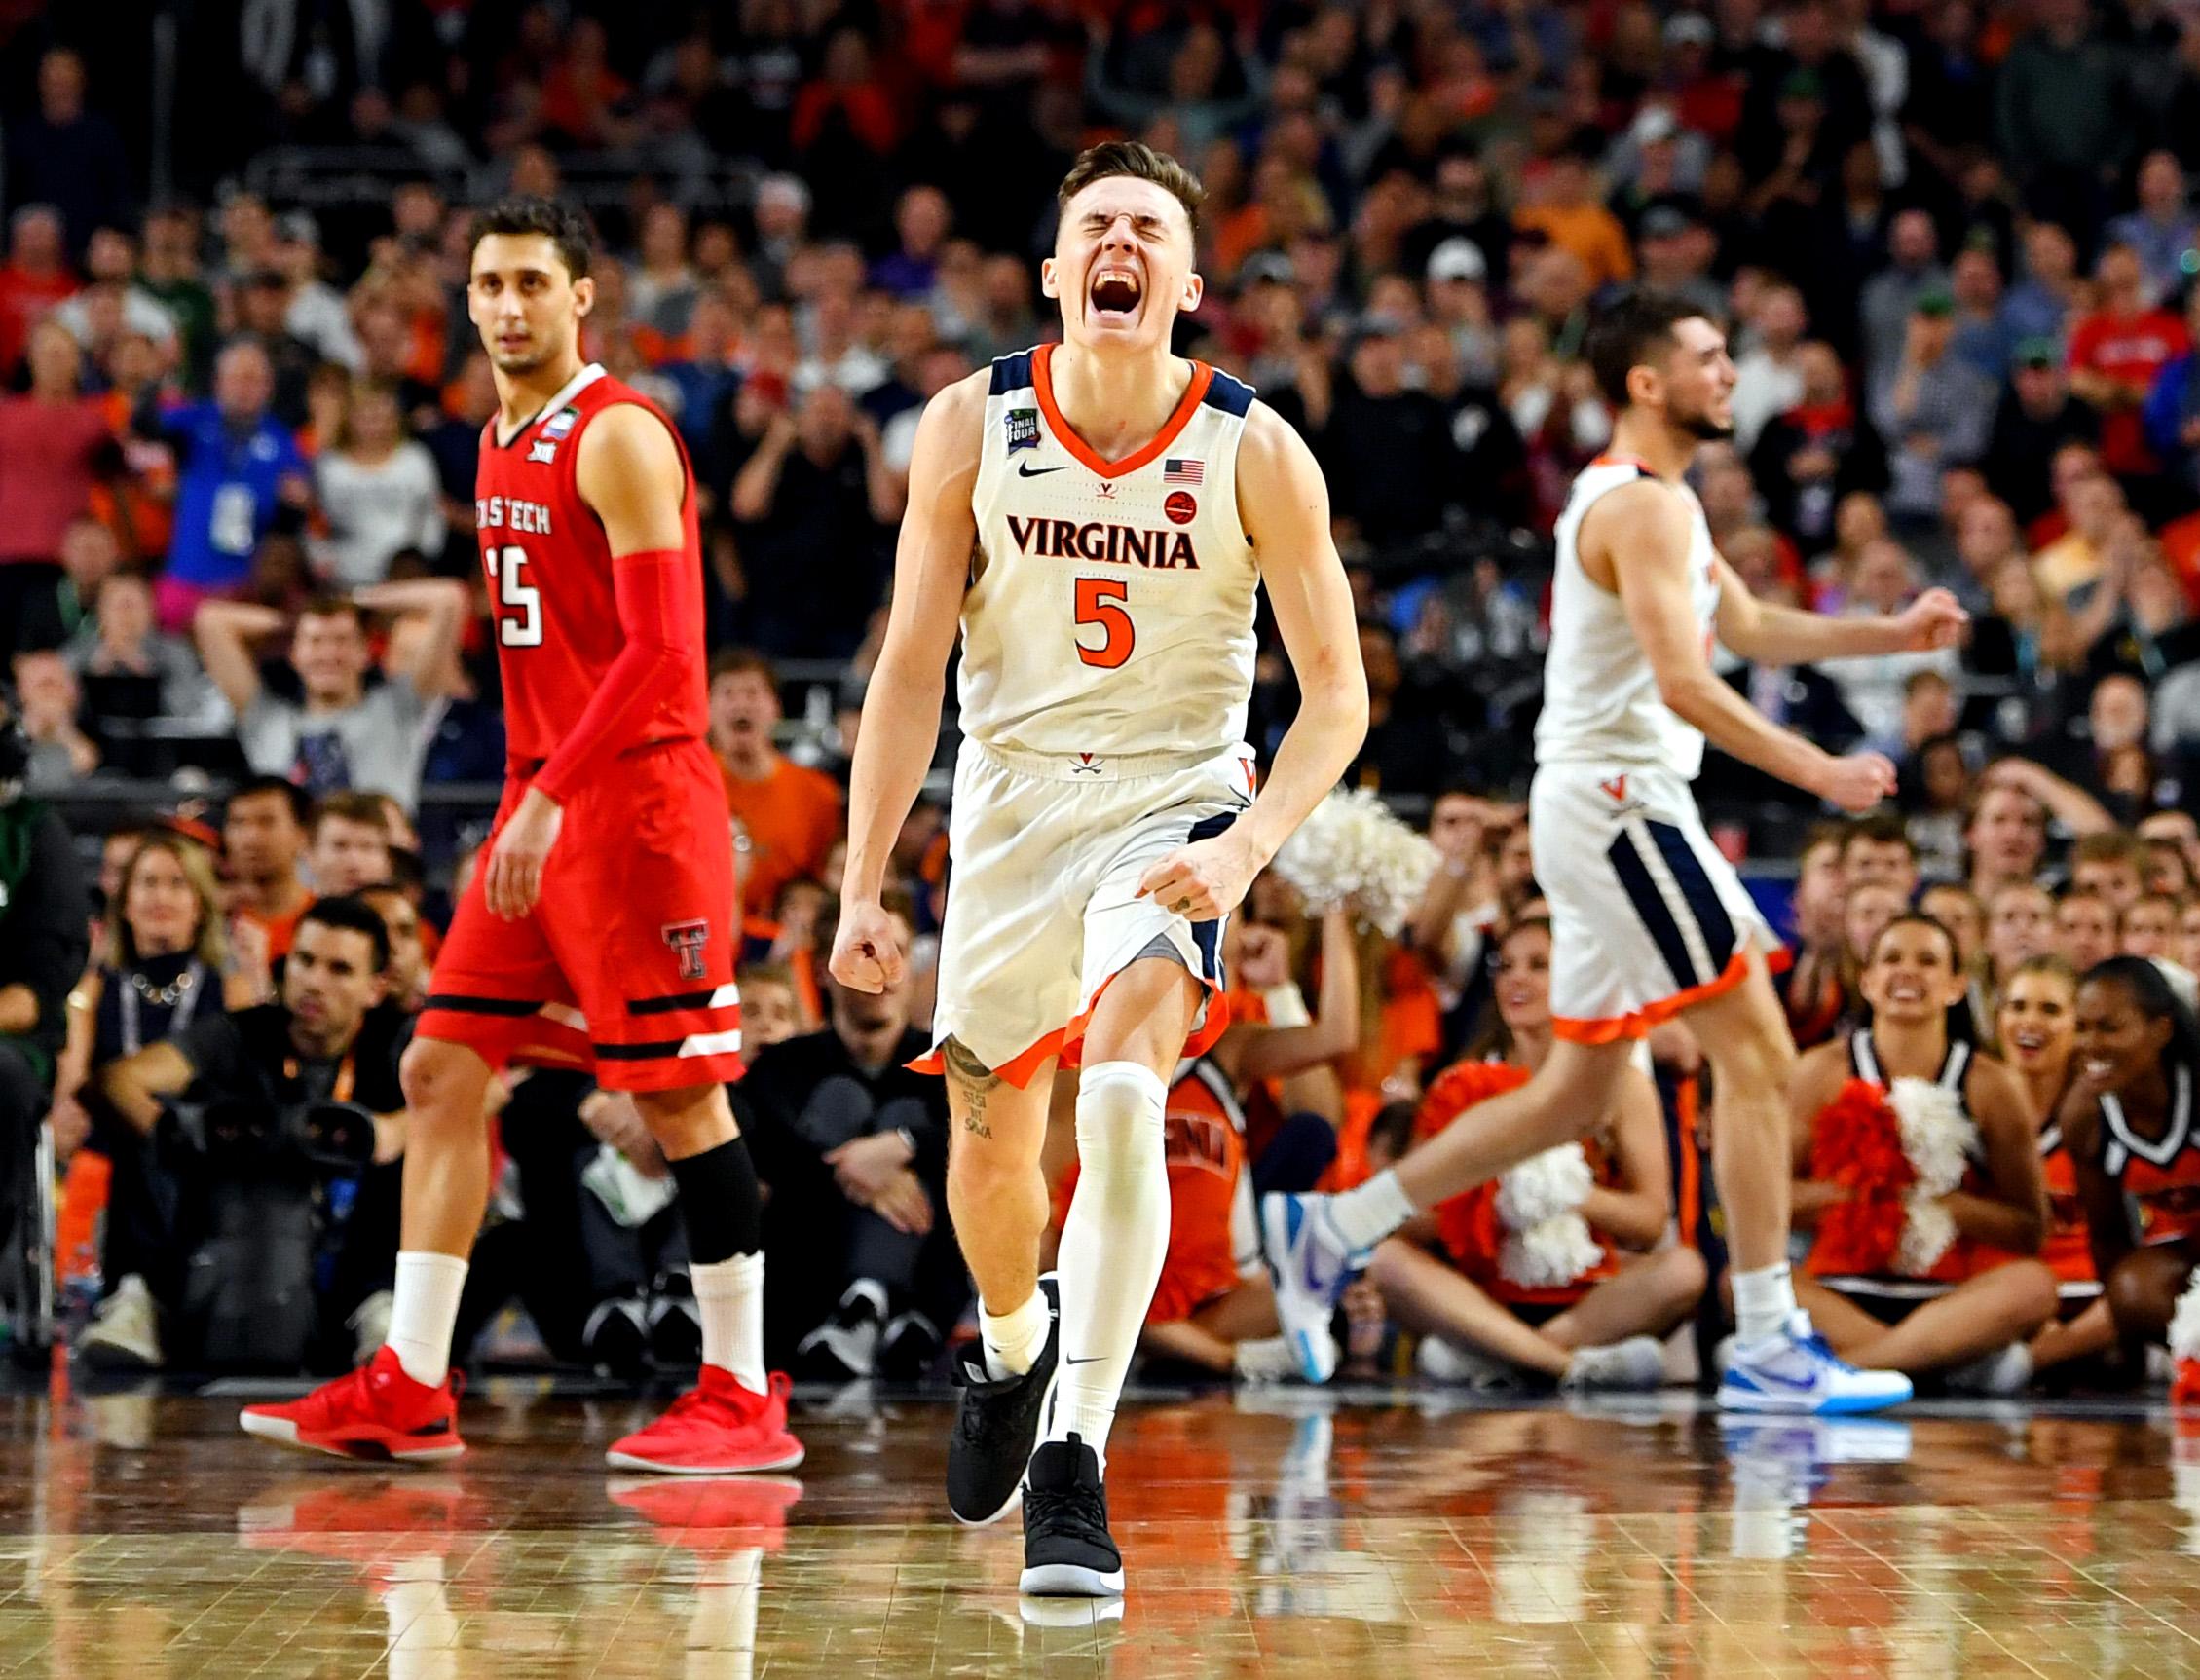 NCAA Basketball: Final Four-National Championship-Virginia vs Texas Tech